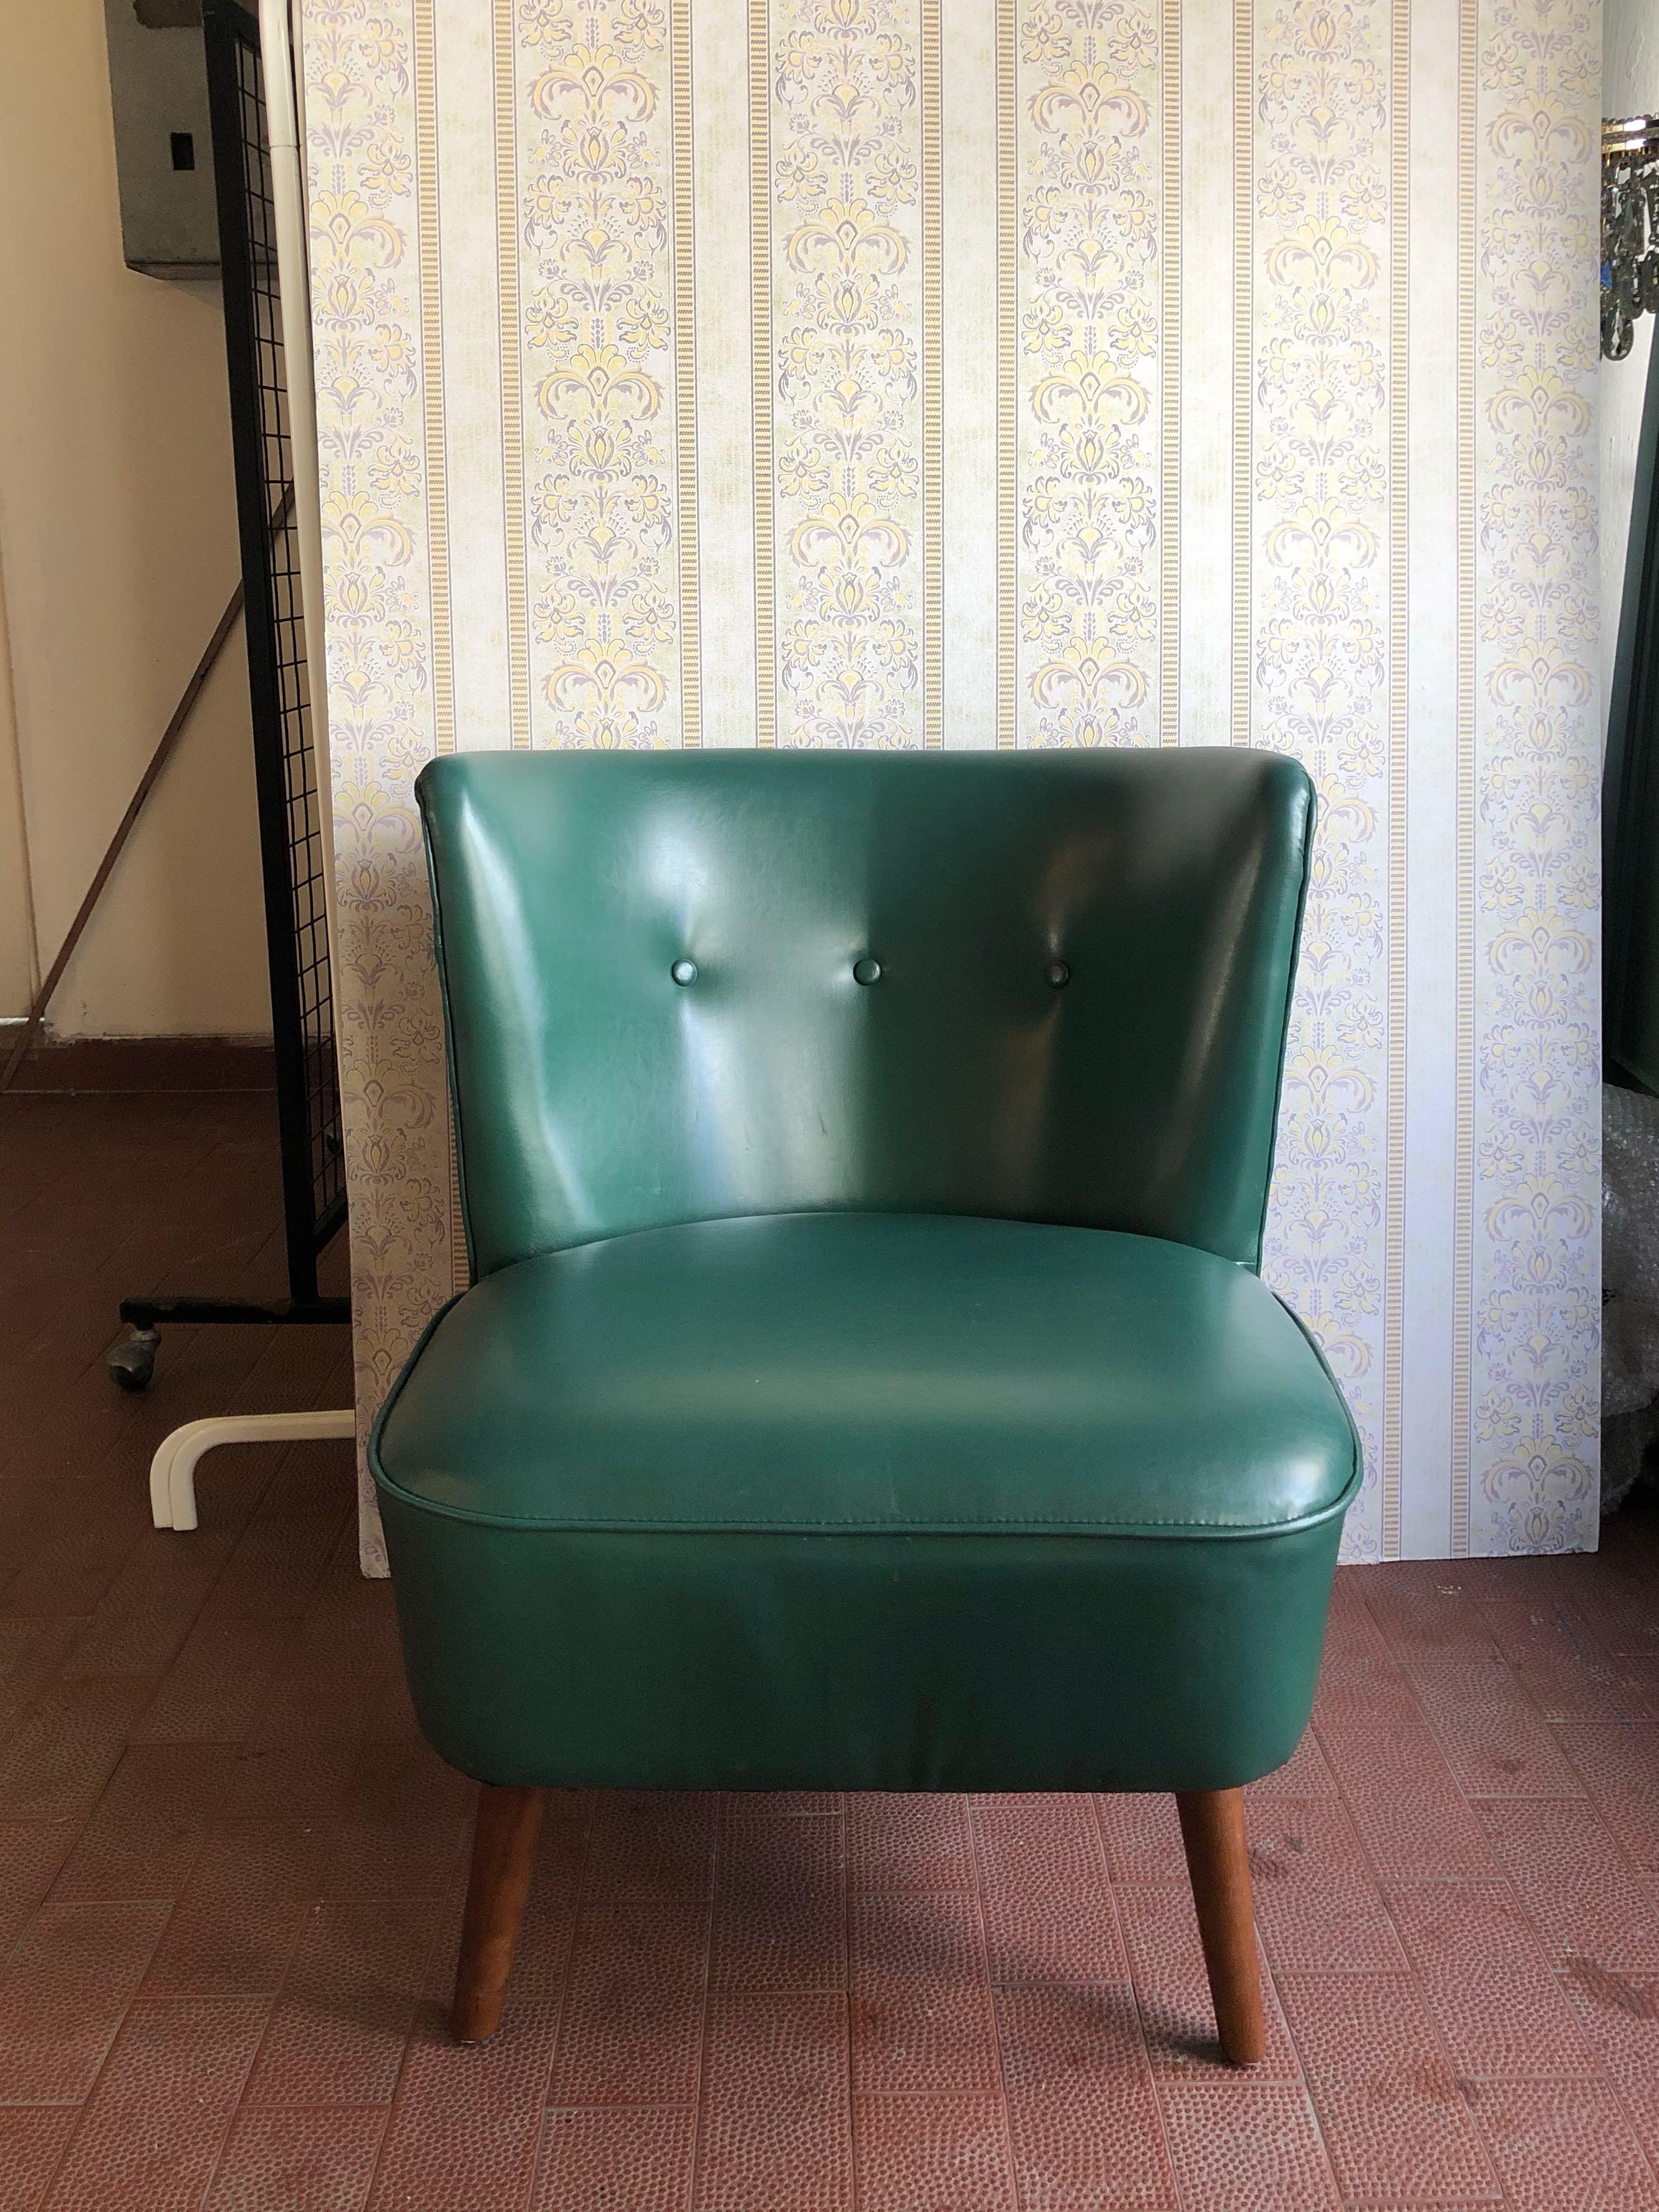 Vintage Retro Dark Green Lounge Chair Furniture Sofas On Carousell